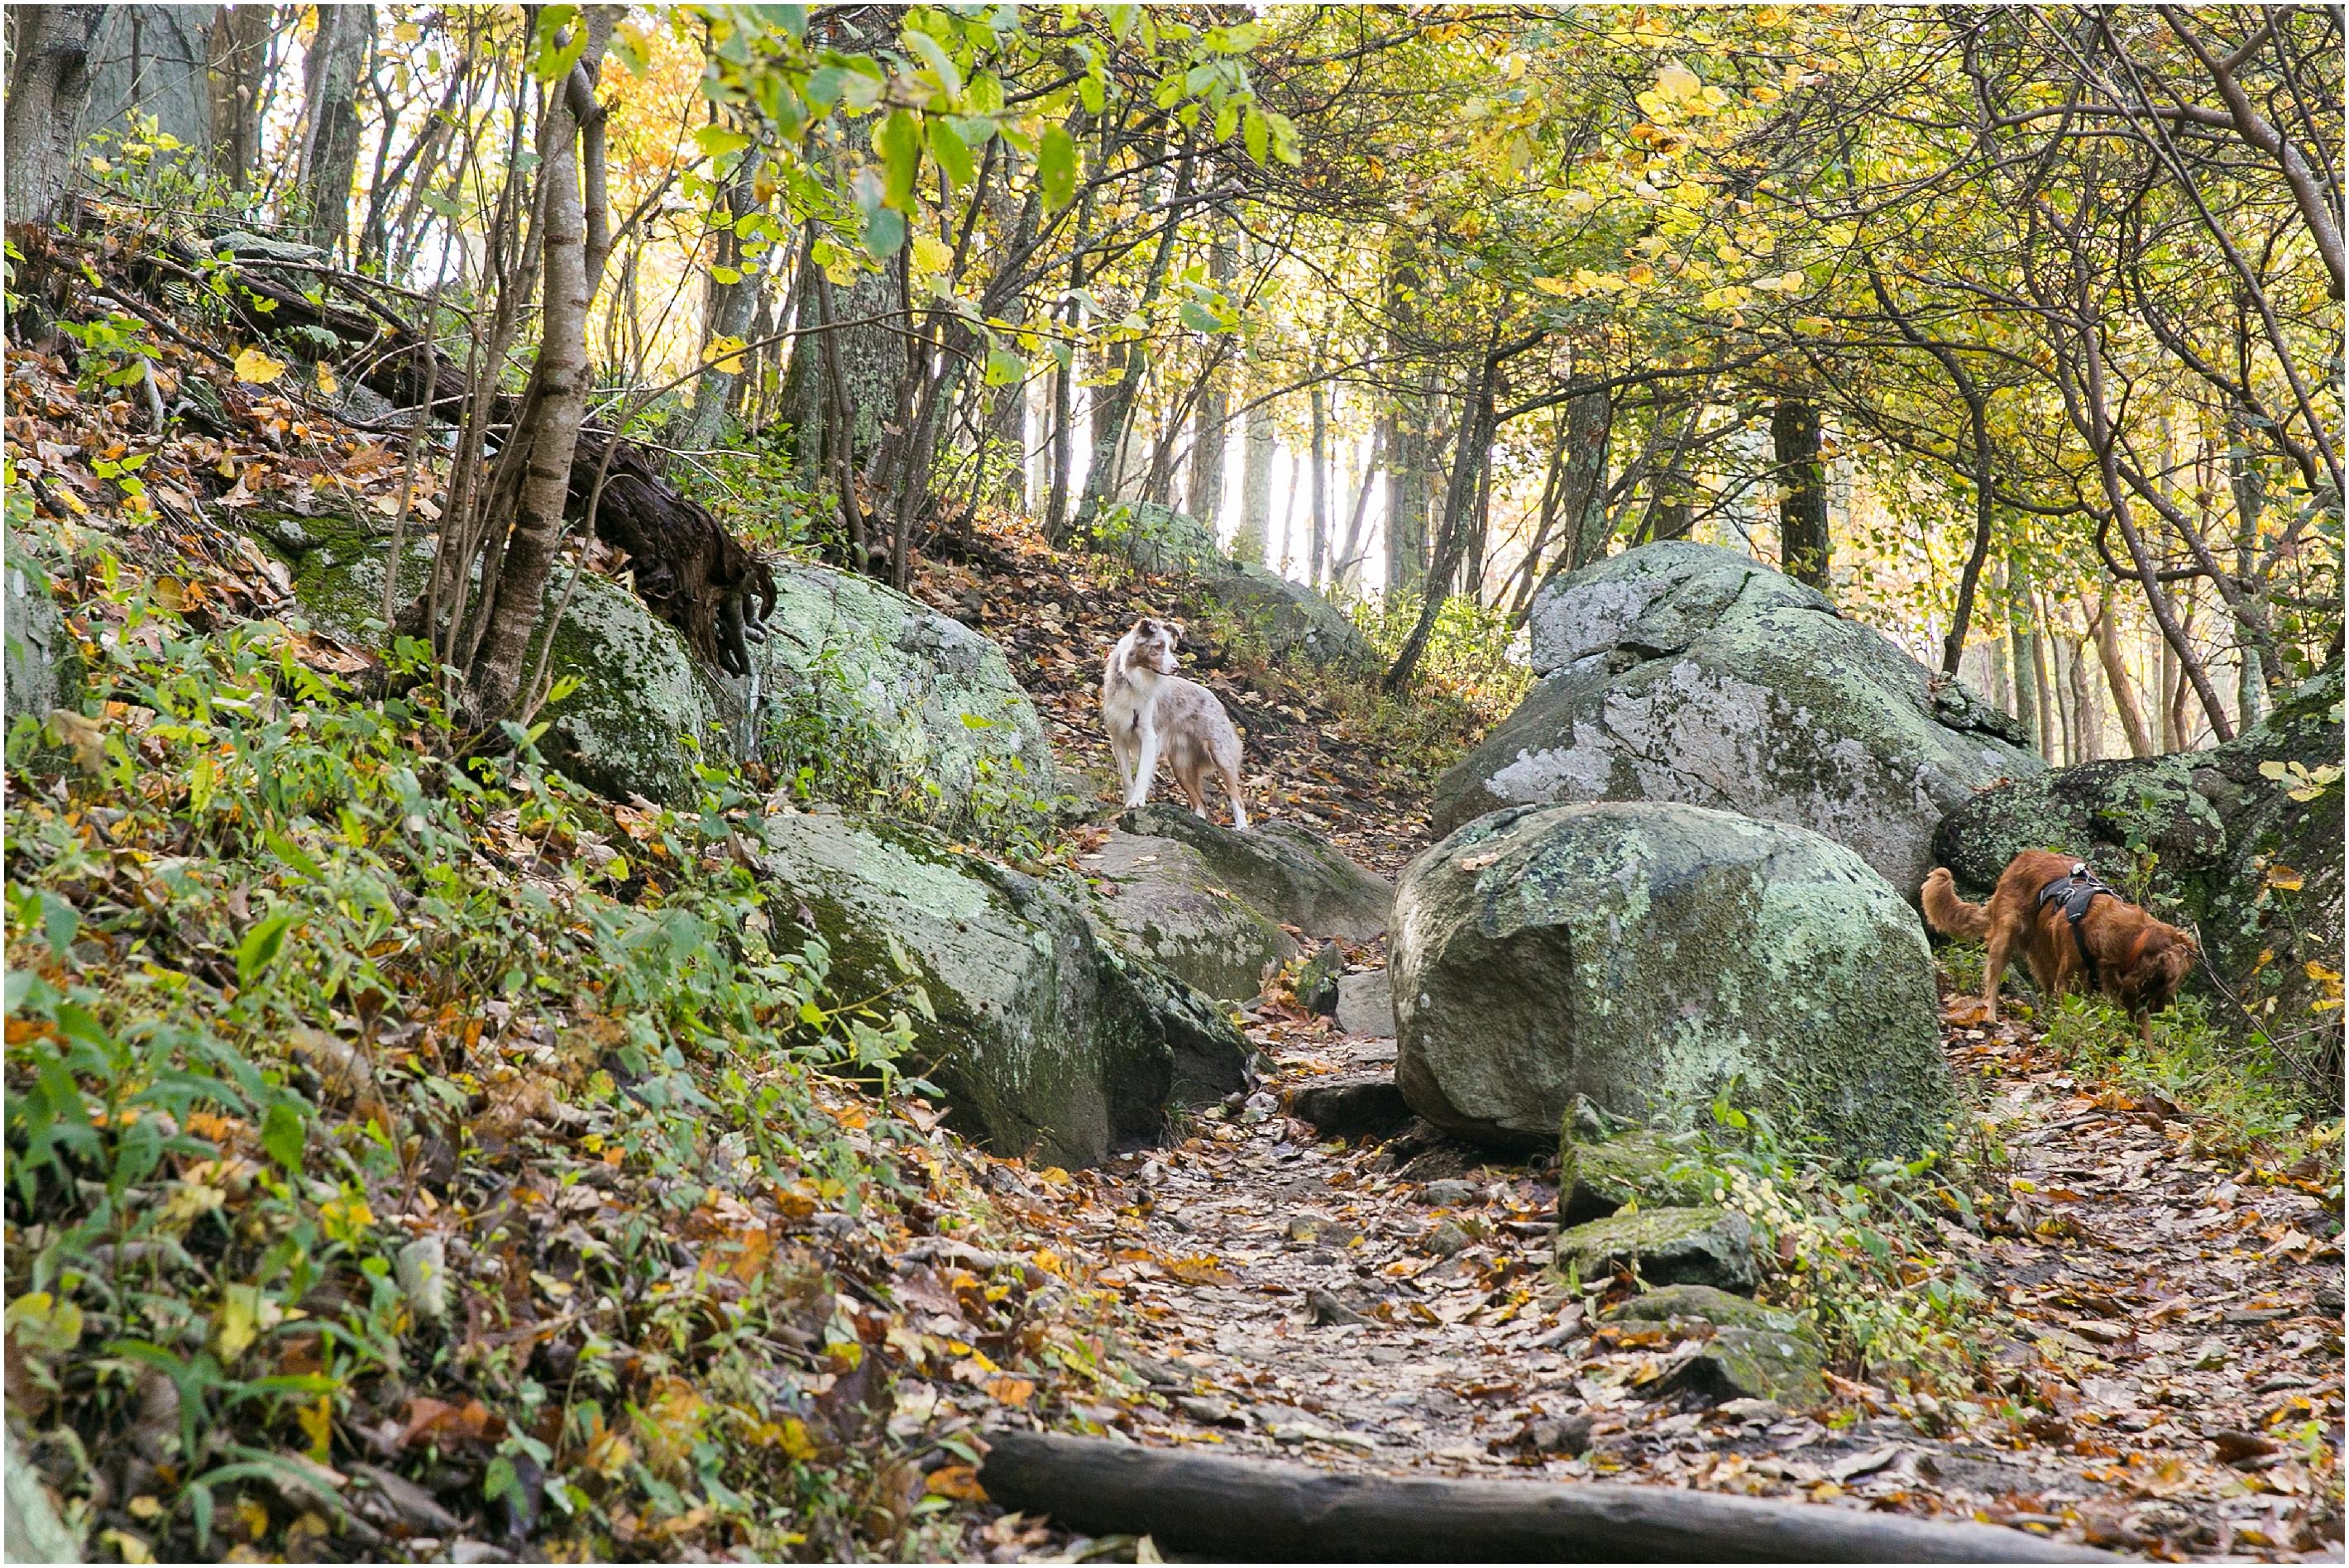 va_jessica_ryan_photography_blue_ridge_mountains_wintergreen_virginia_charlottesville_appalachian_trail_0156